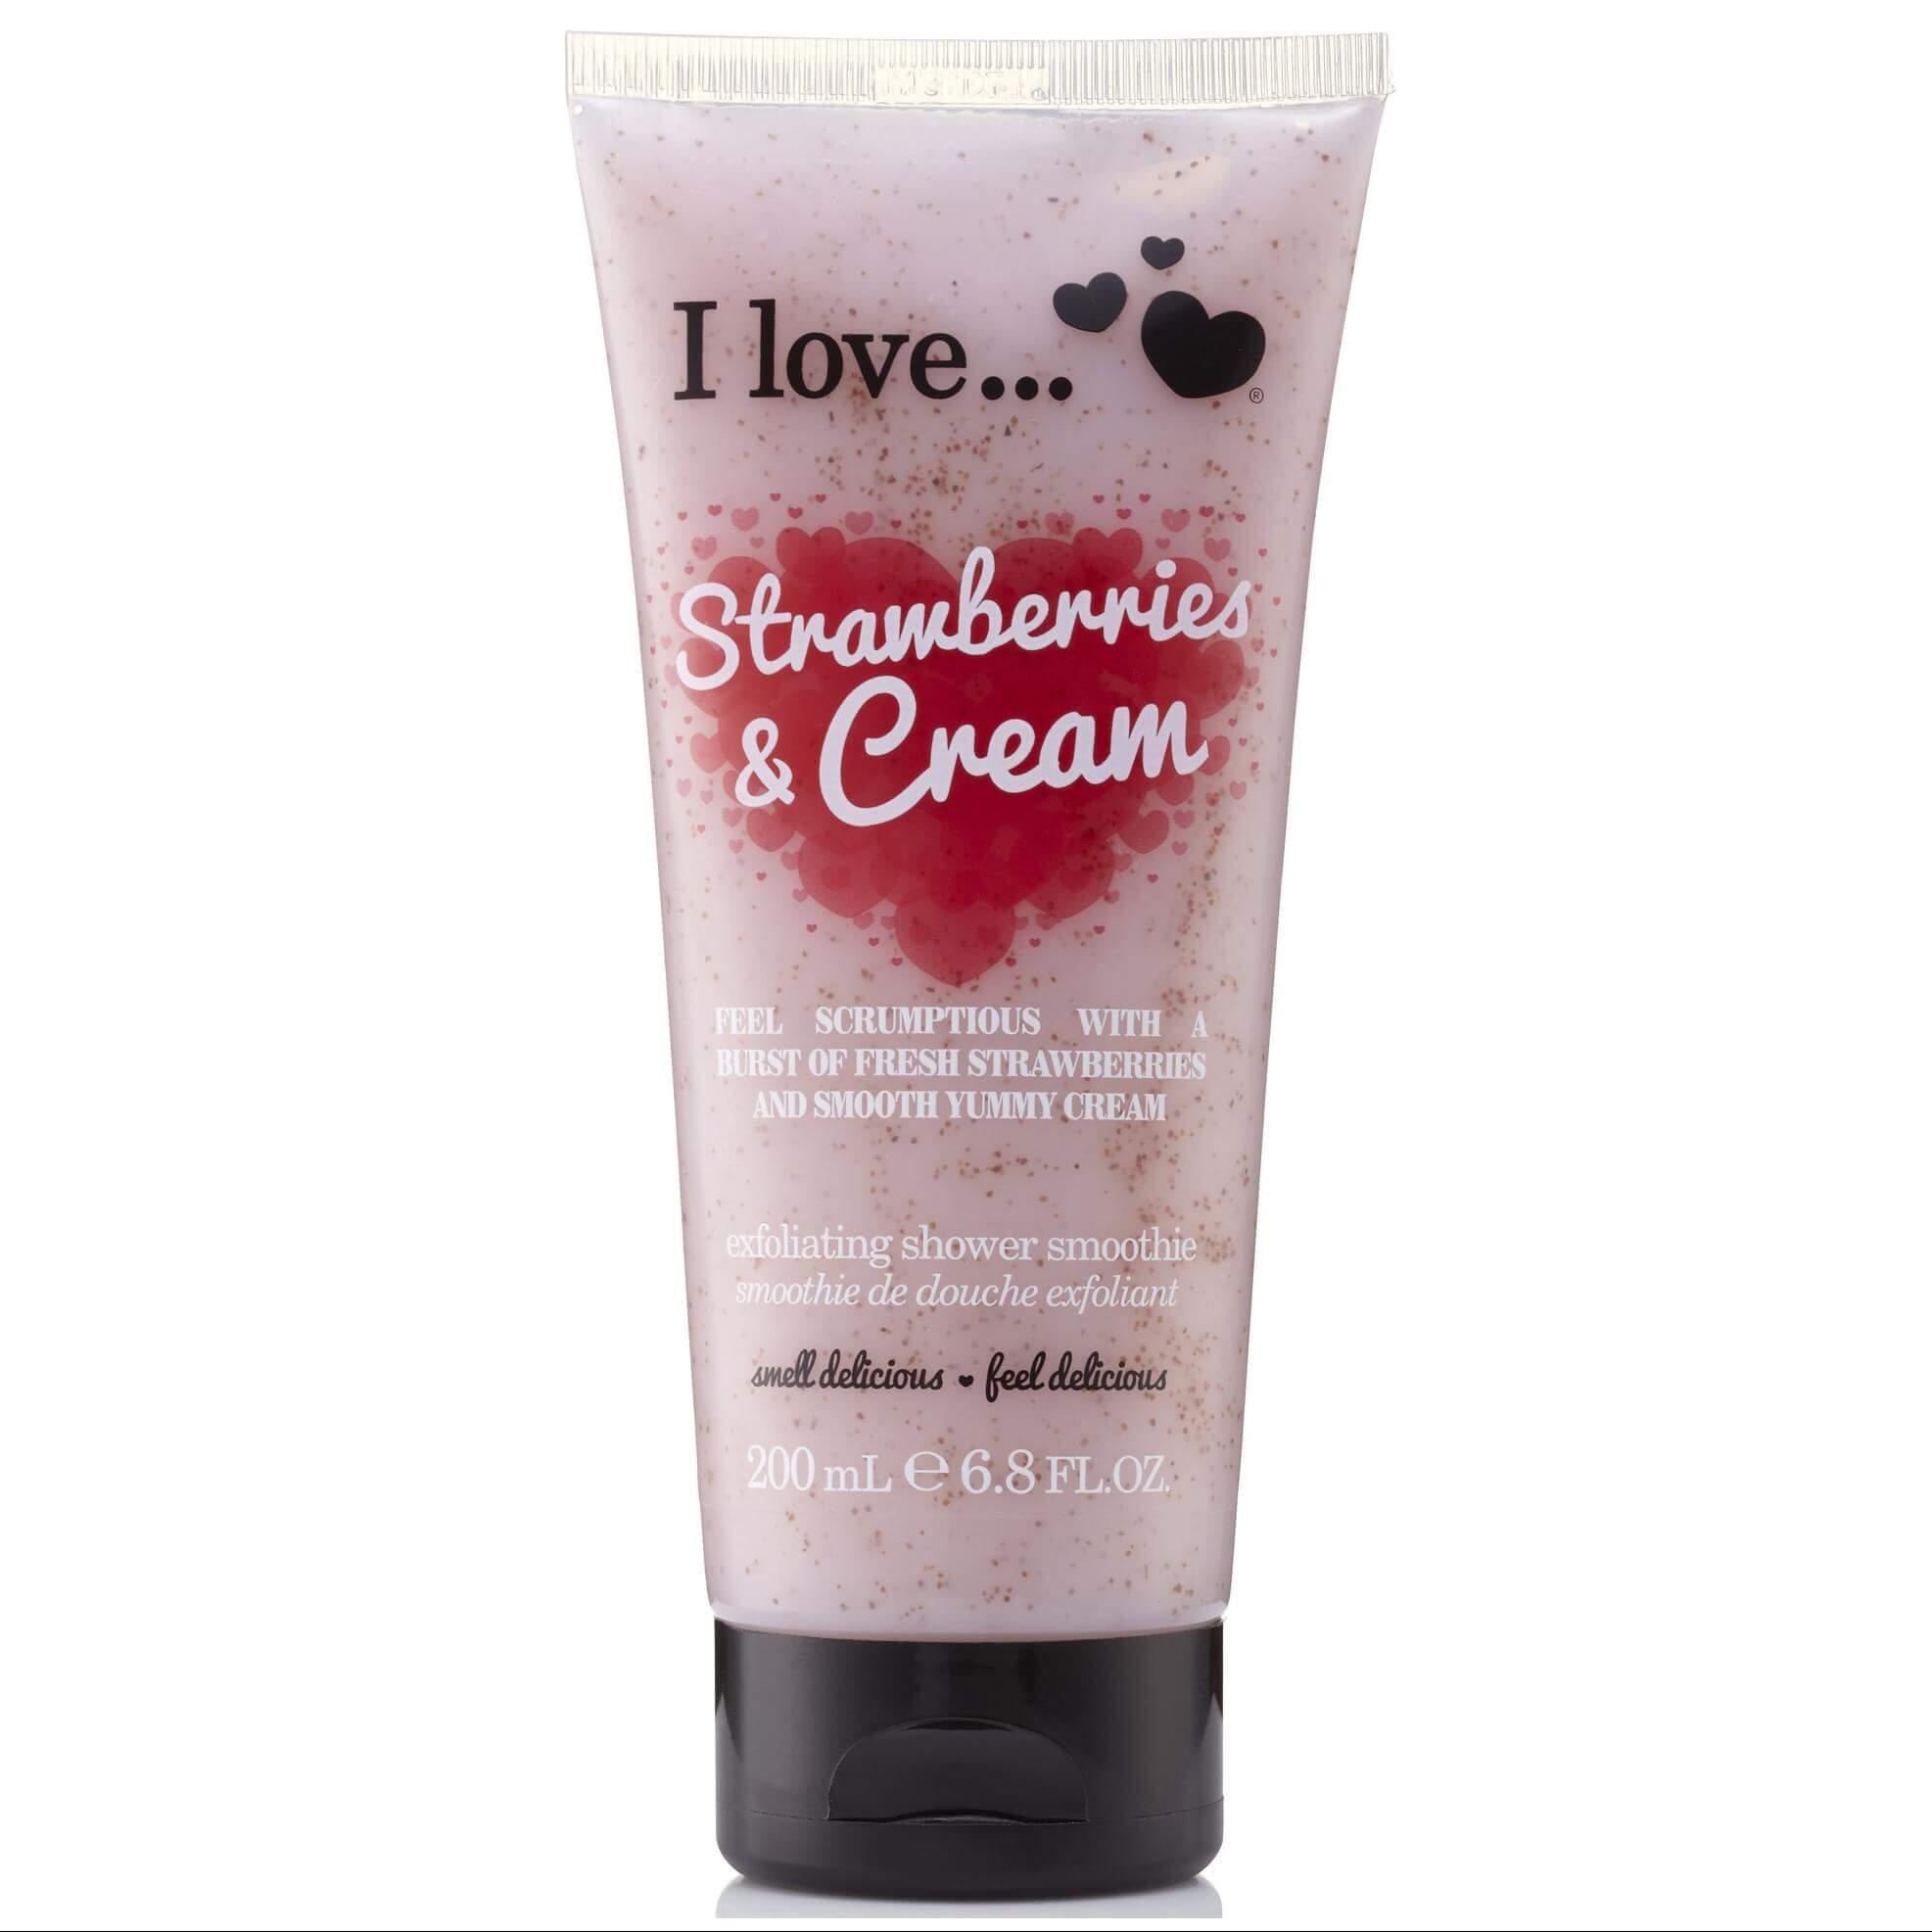 I love… Exfoliating Shower Smoothie Απολεπιστικό Αφρόλουτρο 200ml – Raspberry & Blackberry